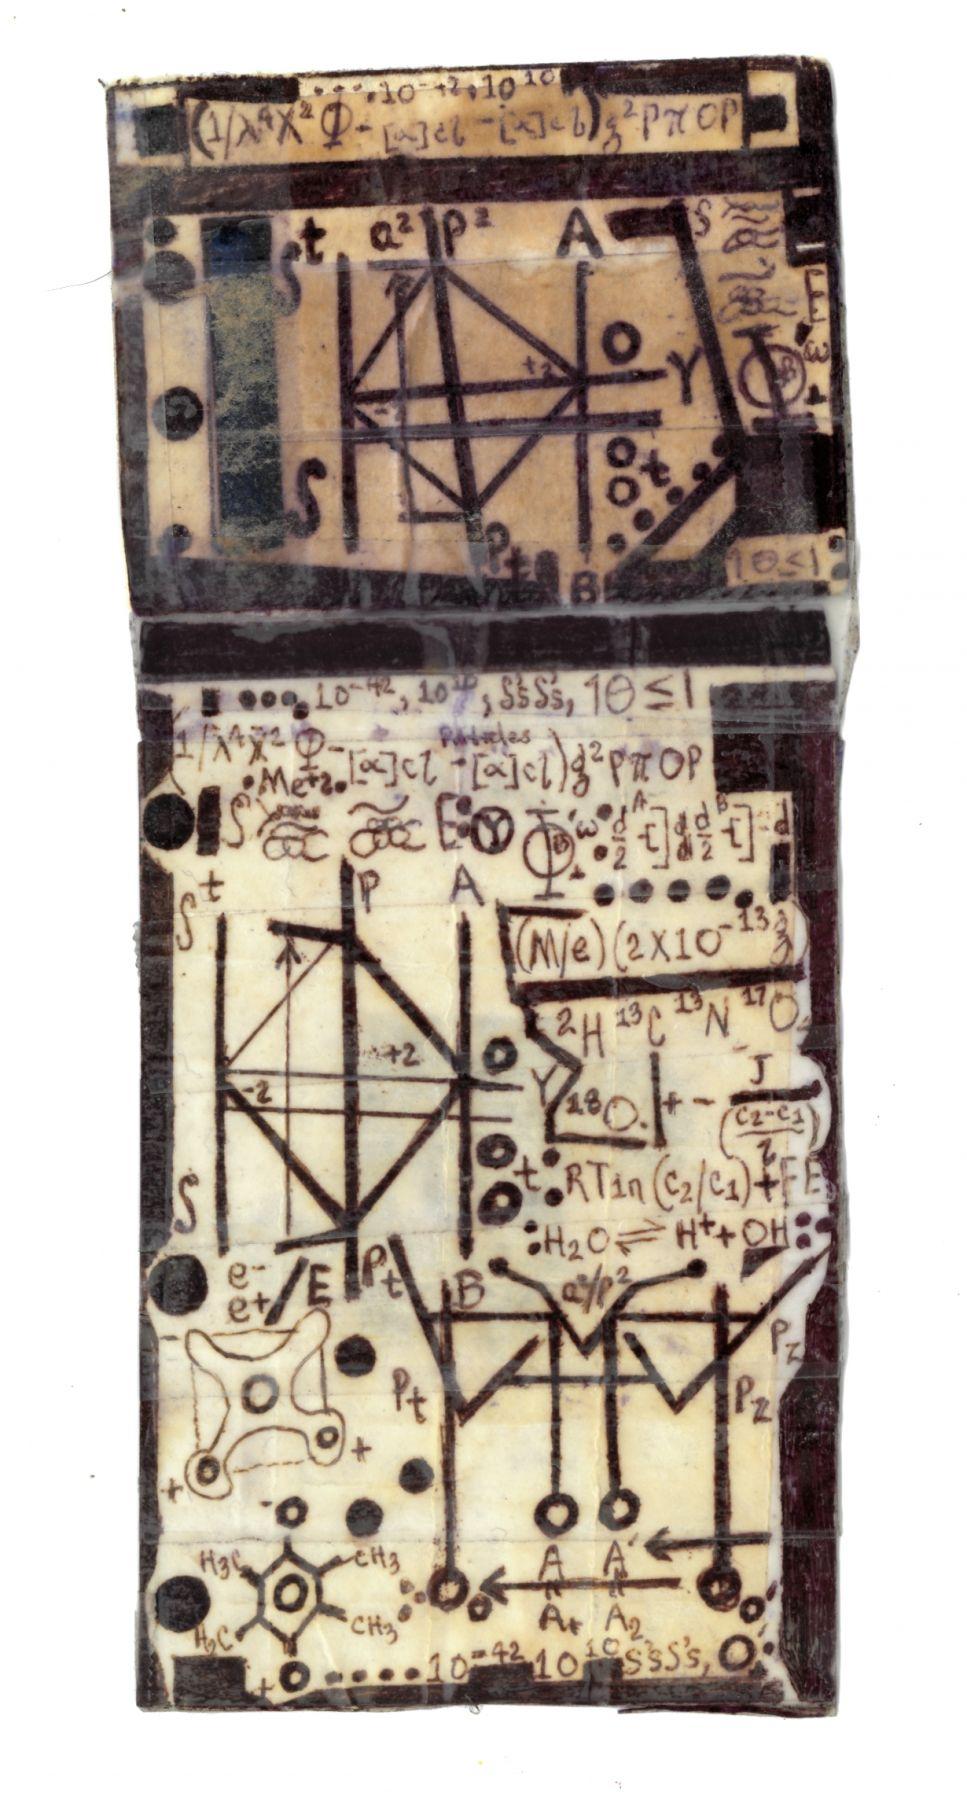 Institu,n.d., Ballpoint pen on paper with Scotch tape